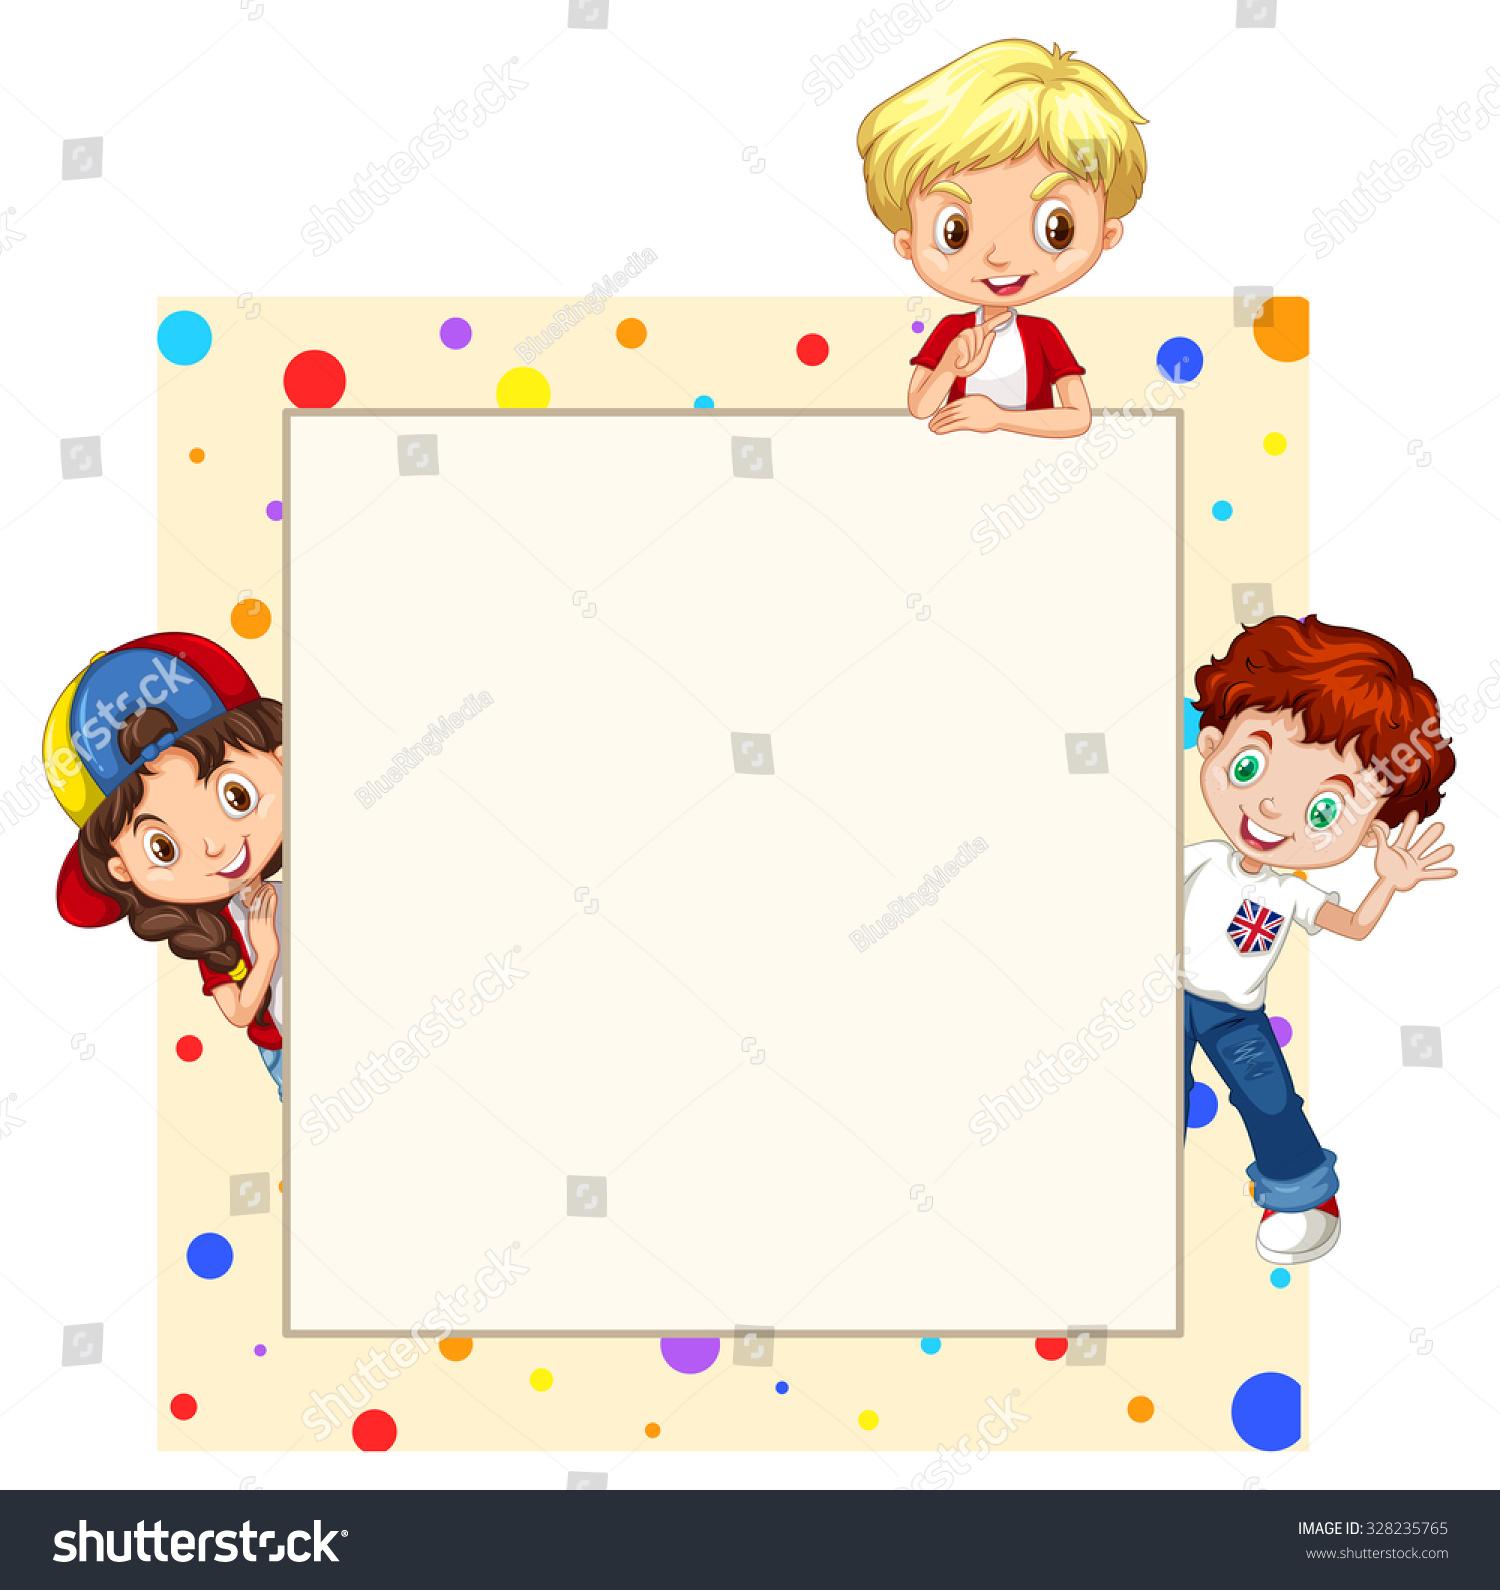 Border Design With Children Illustration - 328235765 : Shutterstock